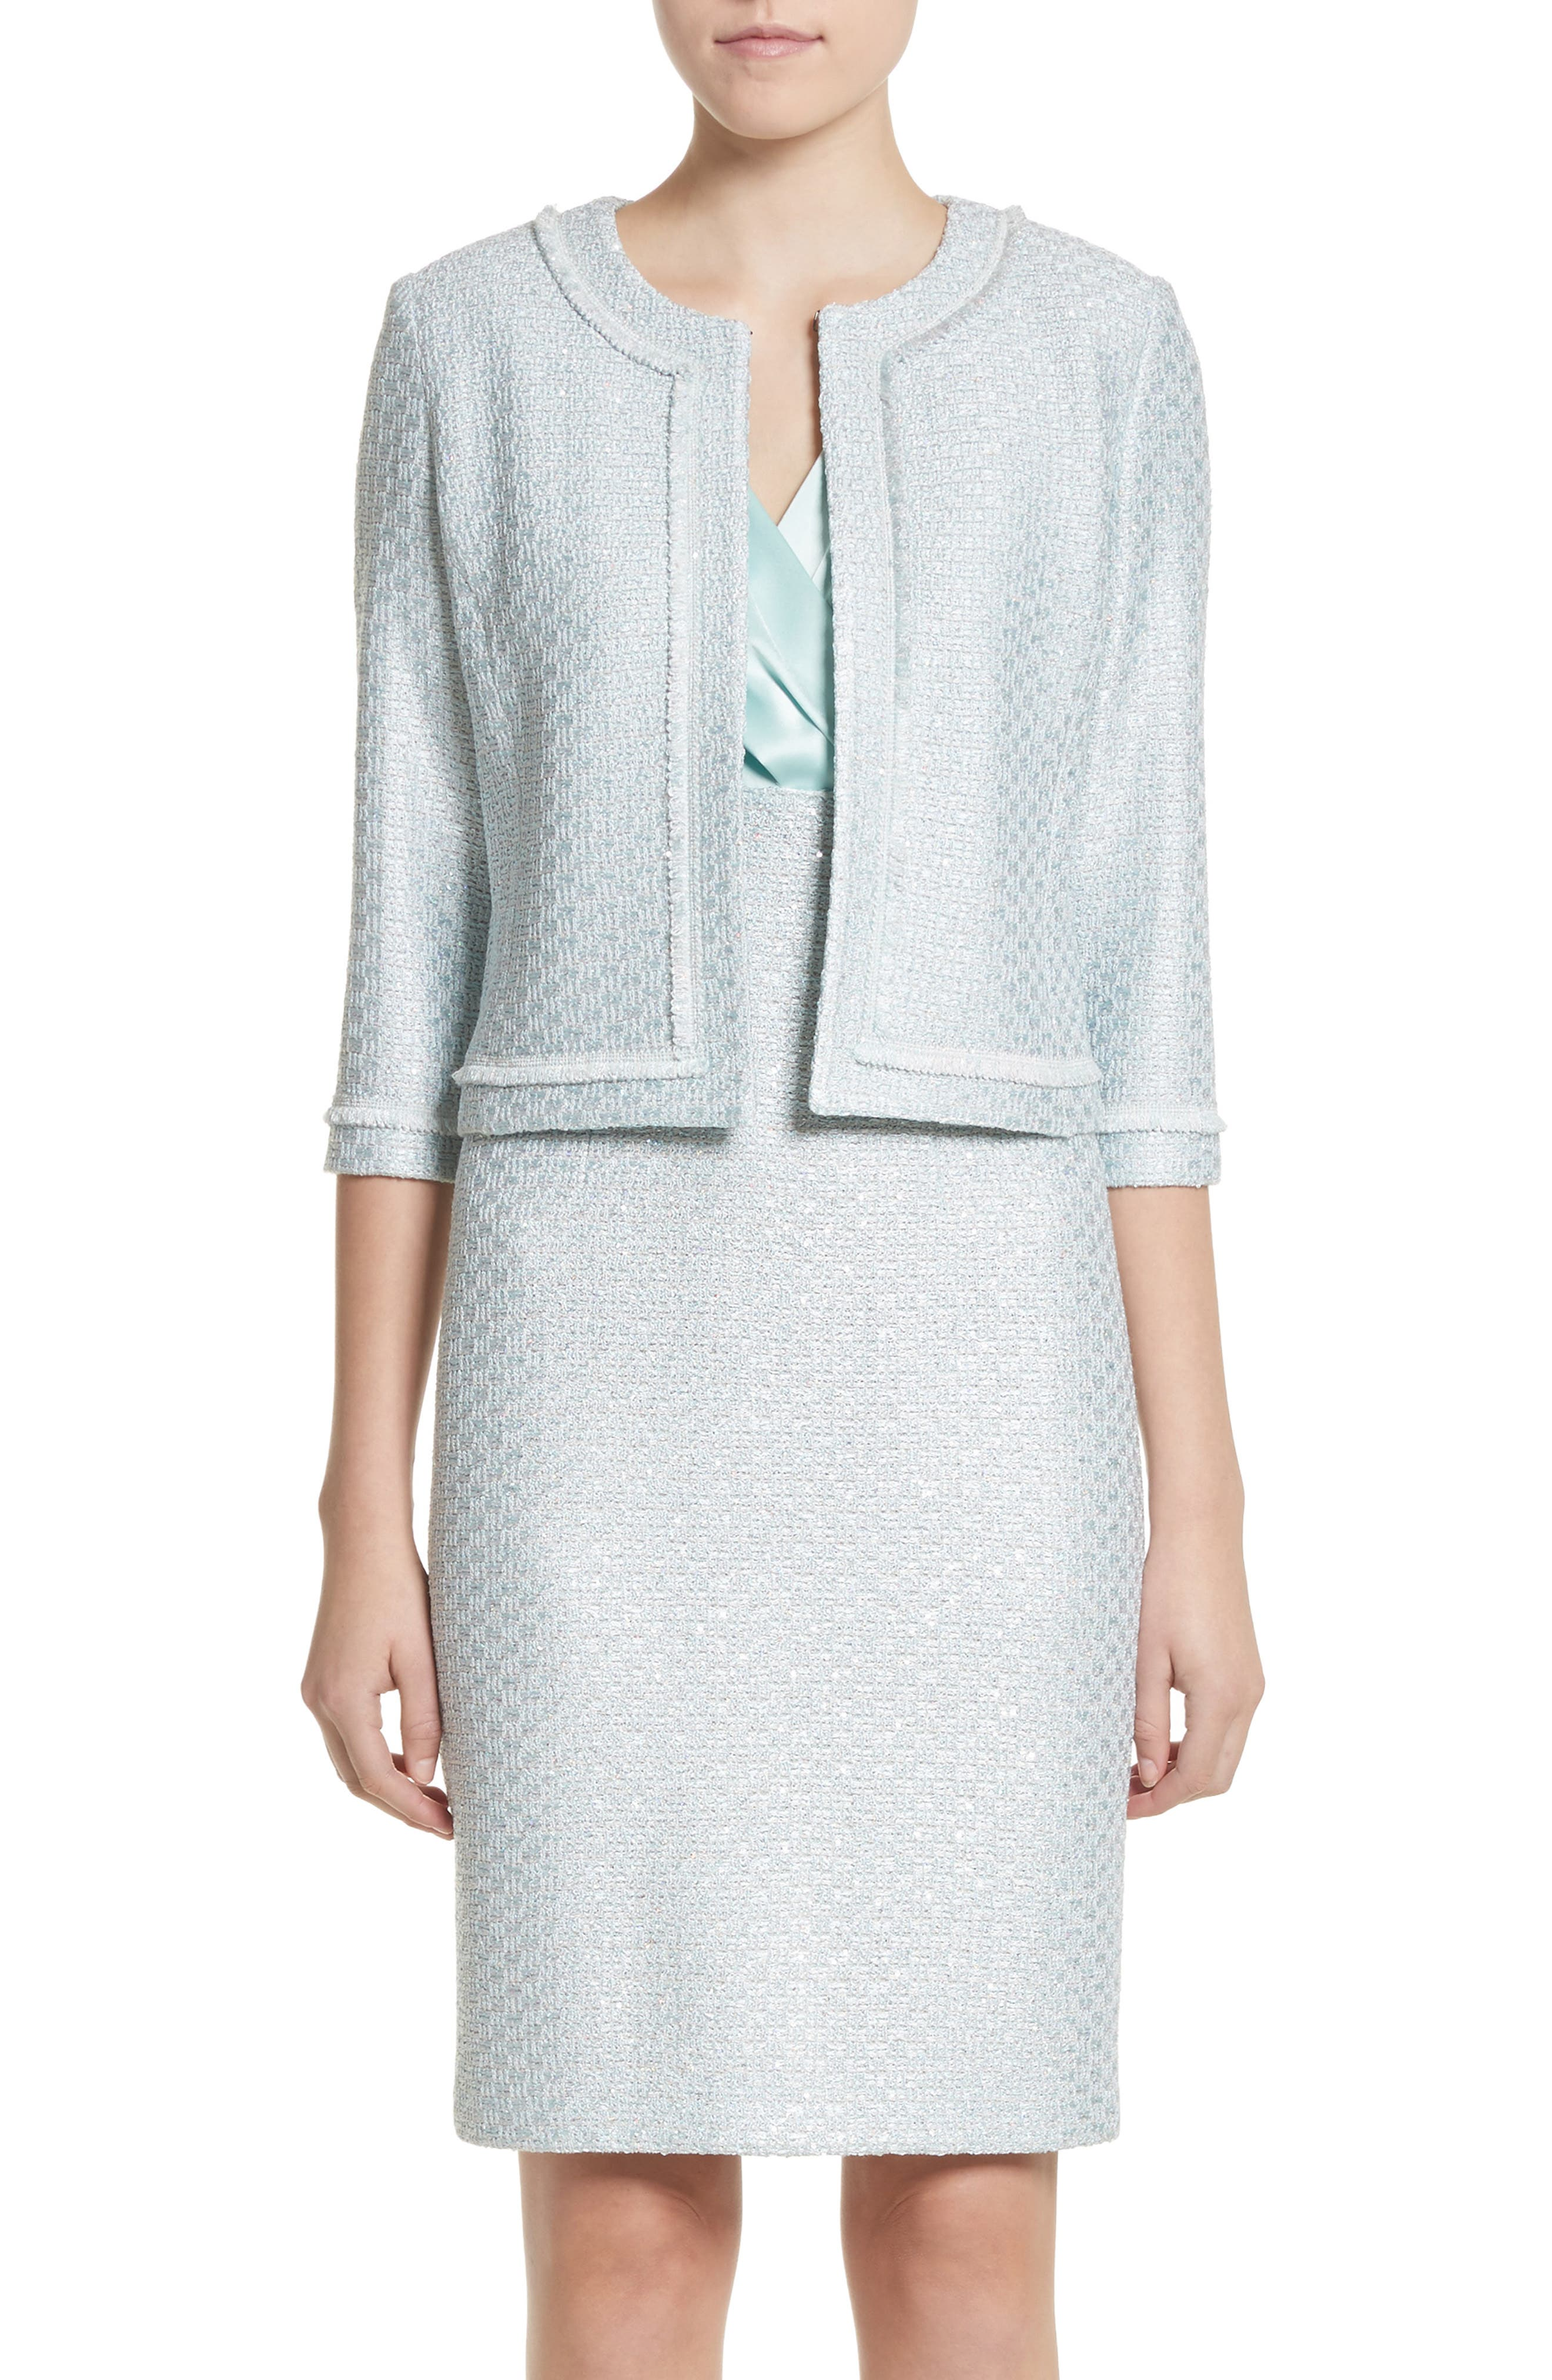 St. John Collection Hansh Sequin Knit Jacket